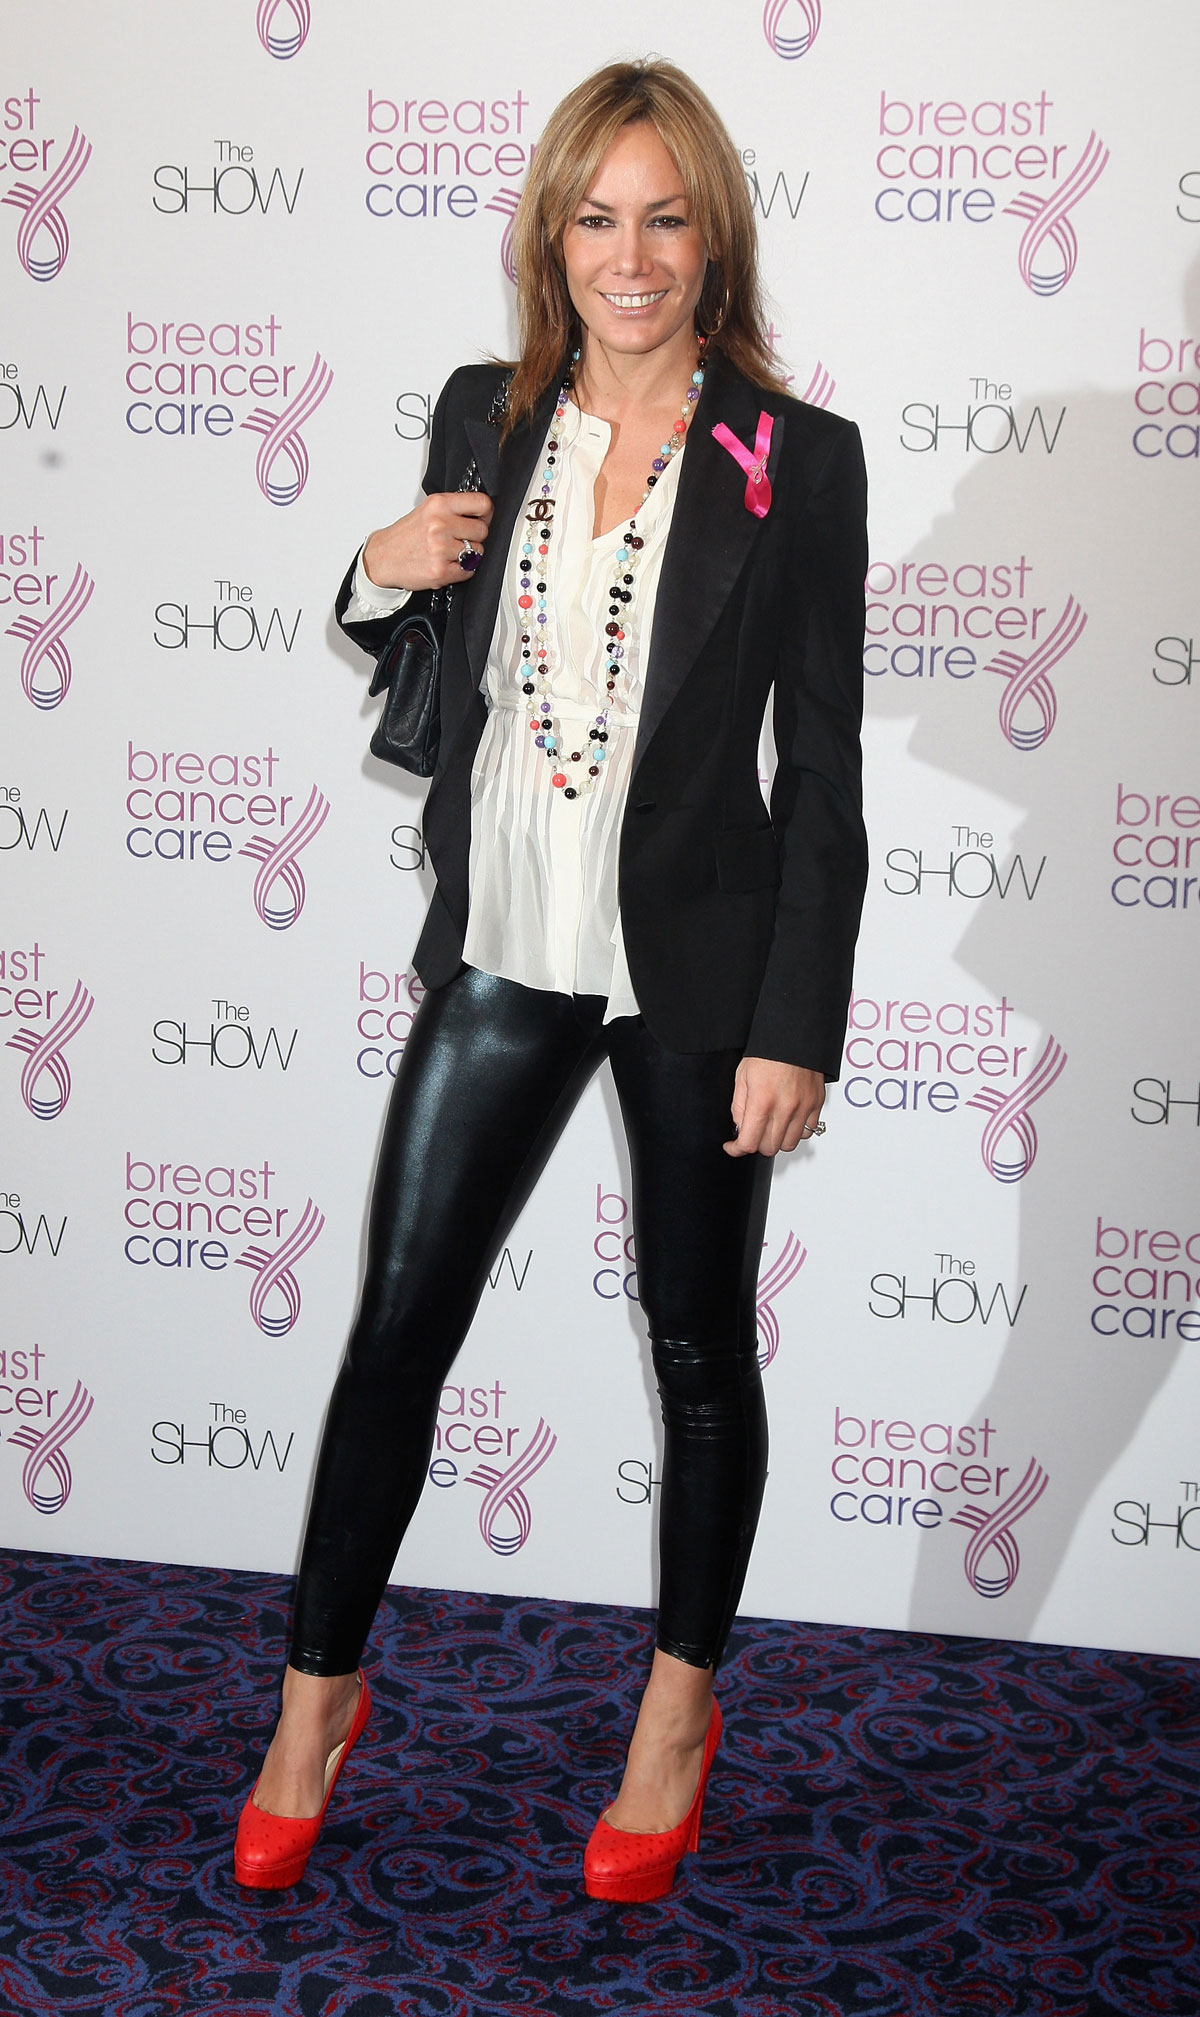 Tara Palmer Tomkinson arrives at The Breast Cancer Care